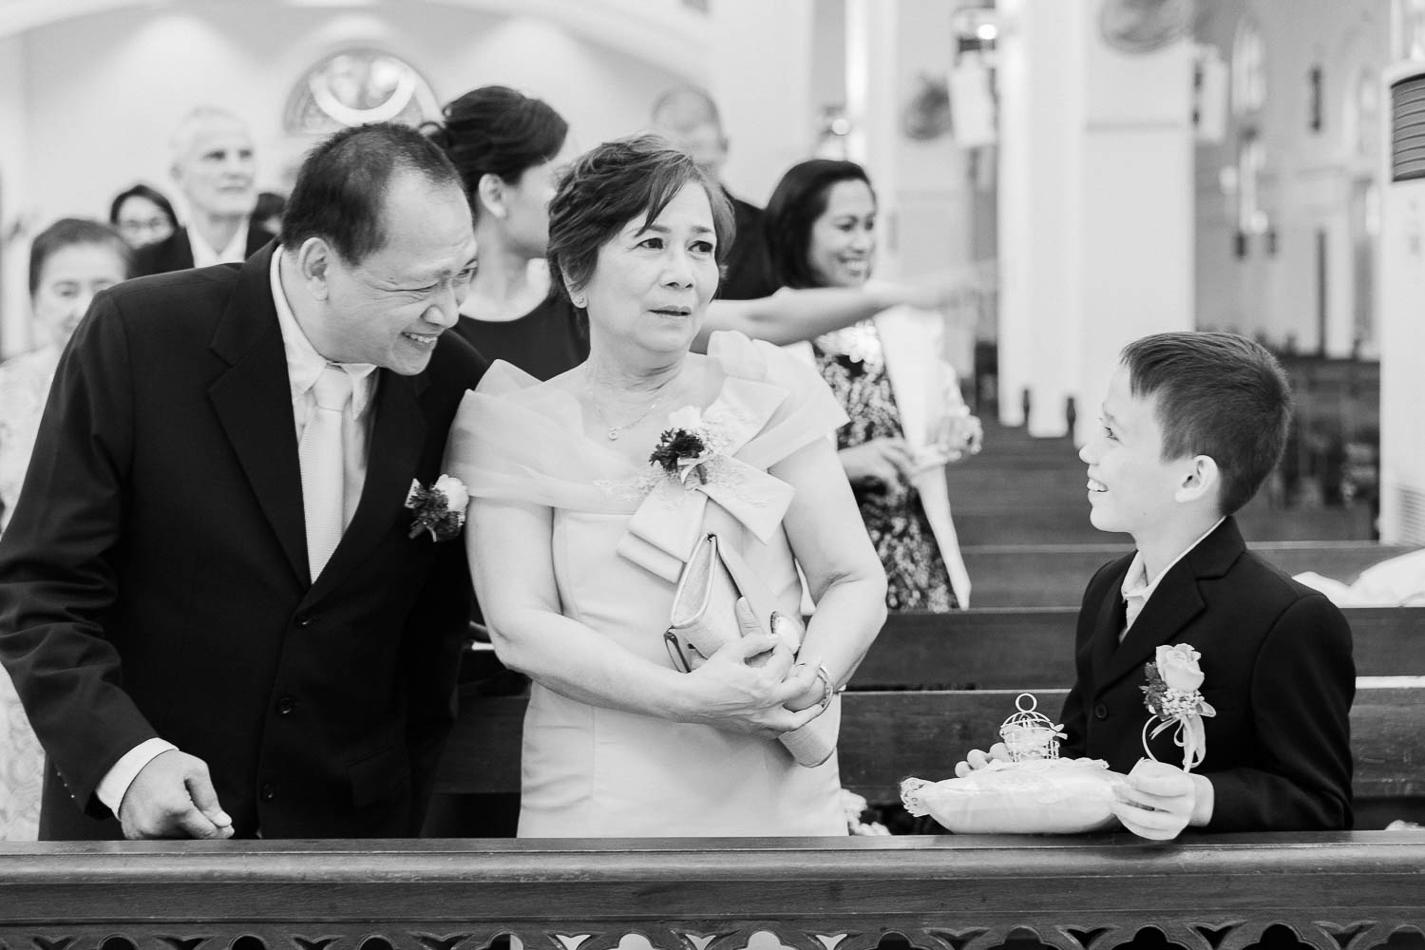 wedding-photographer-singapore-film-photographer-chen-sands-Anglea-wedding-CSPBLOG-12.jpg